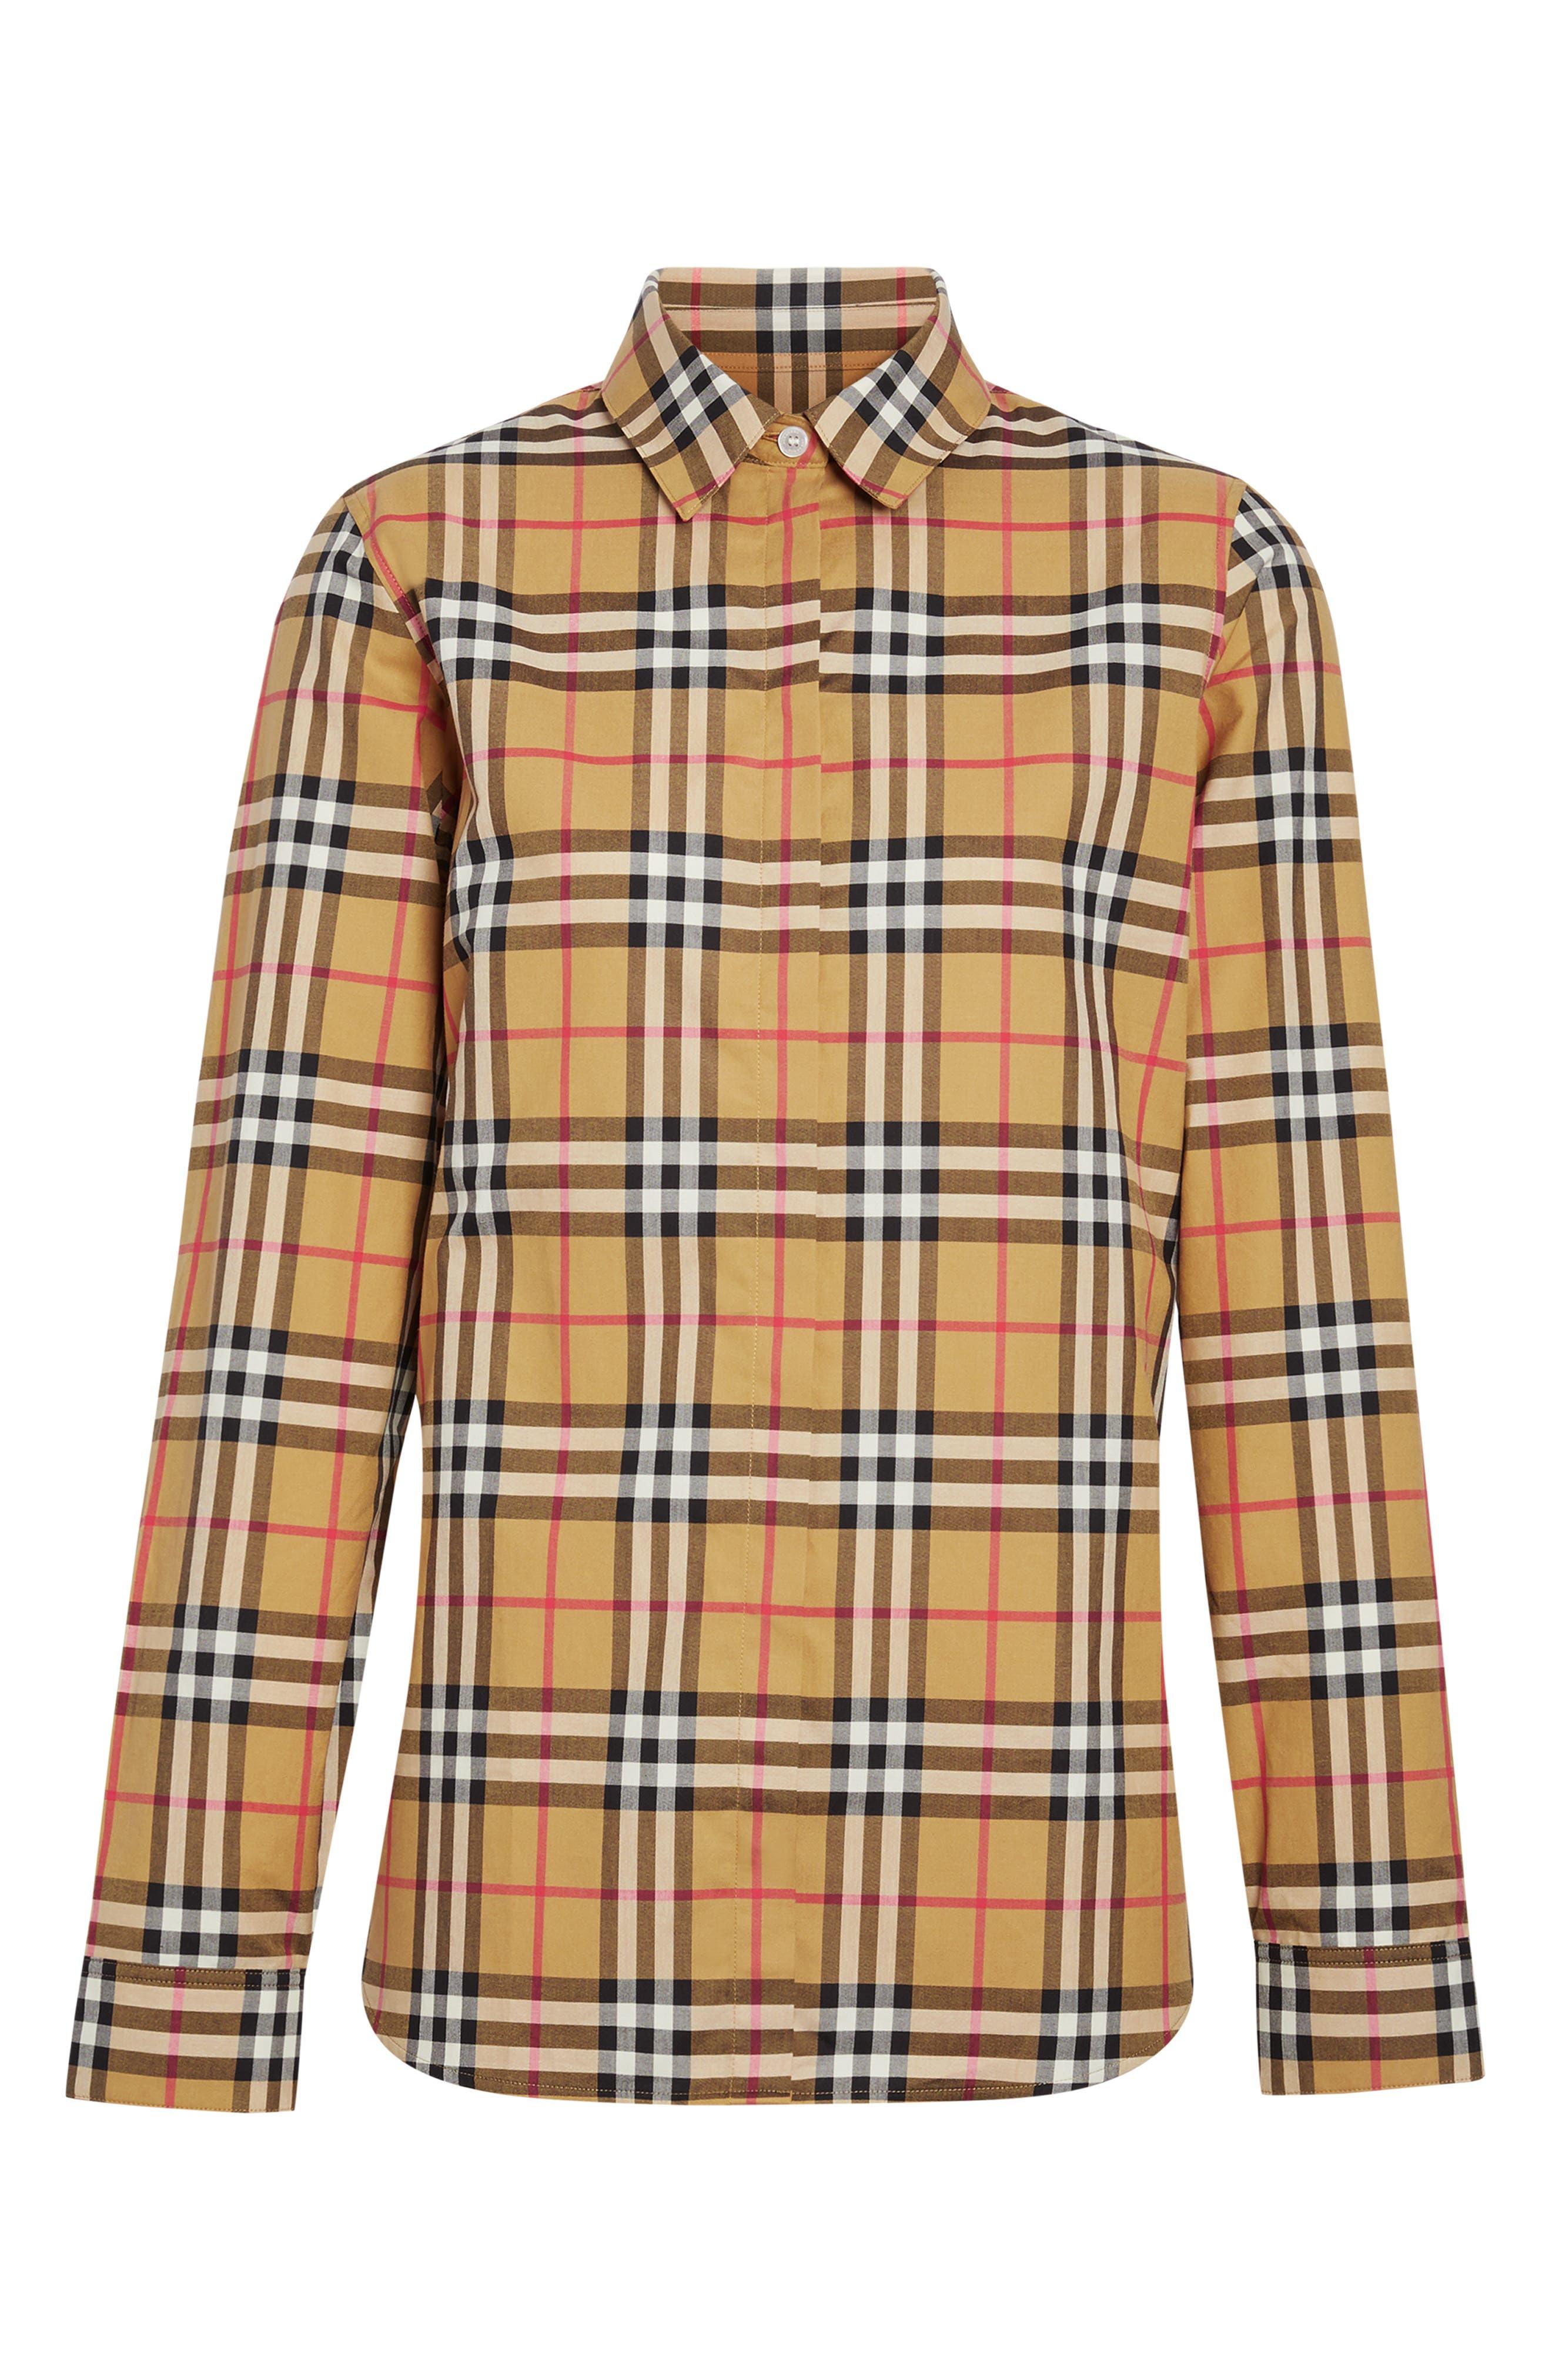 Crow Vintage Check Shirt,                             Alternate thumbnail 3, color,                             ANTIQUE YELLOW CHECK